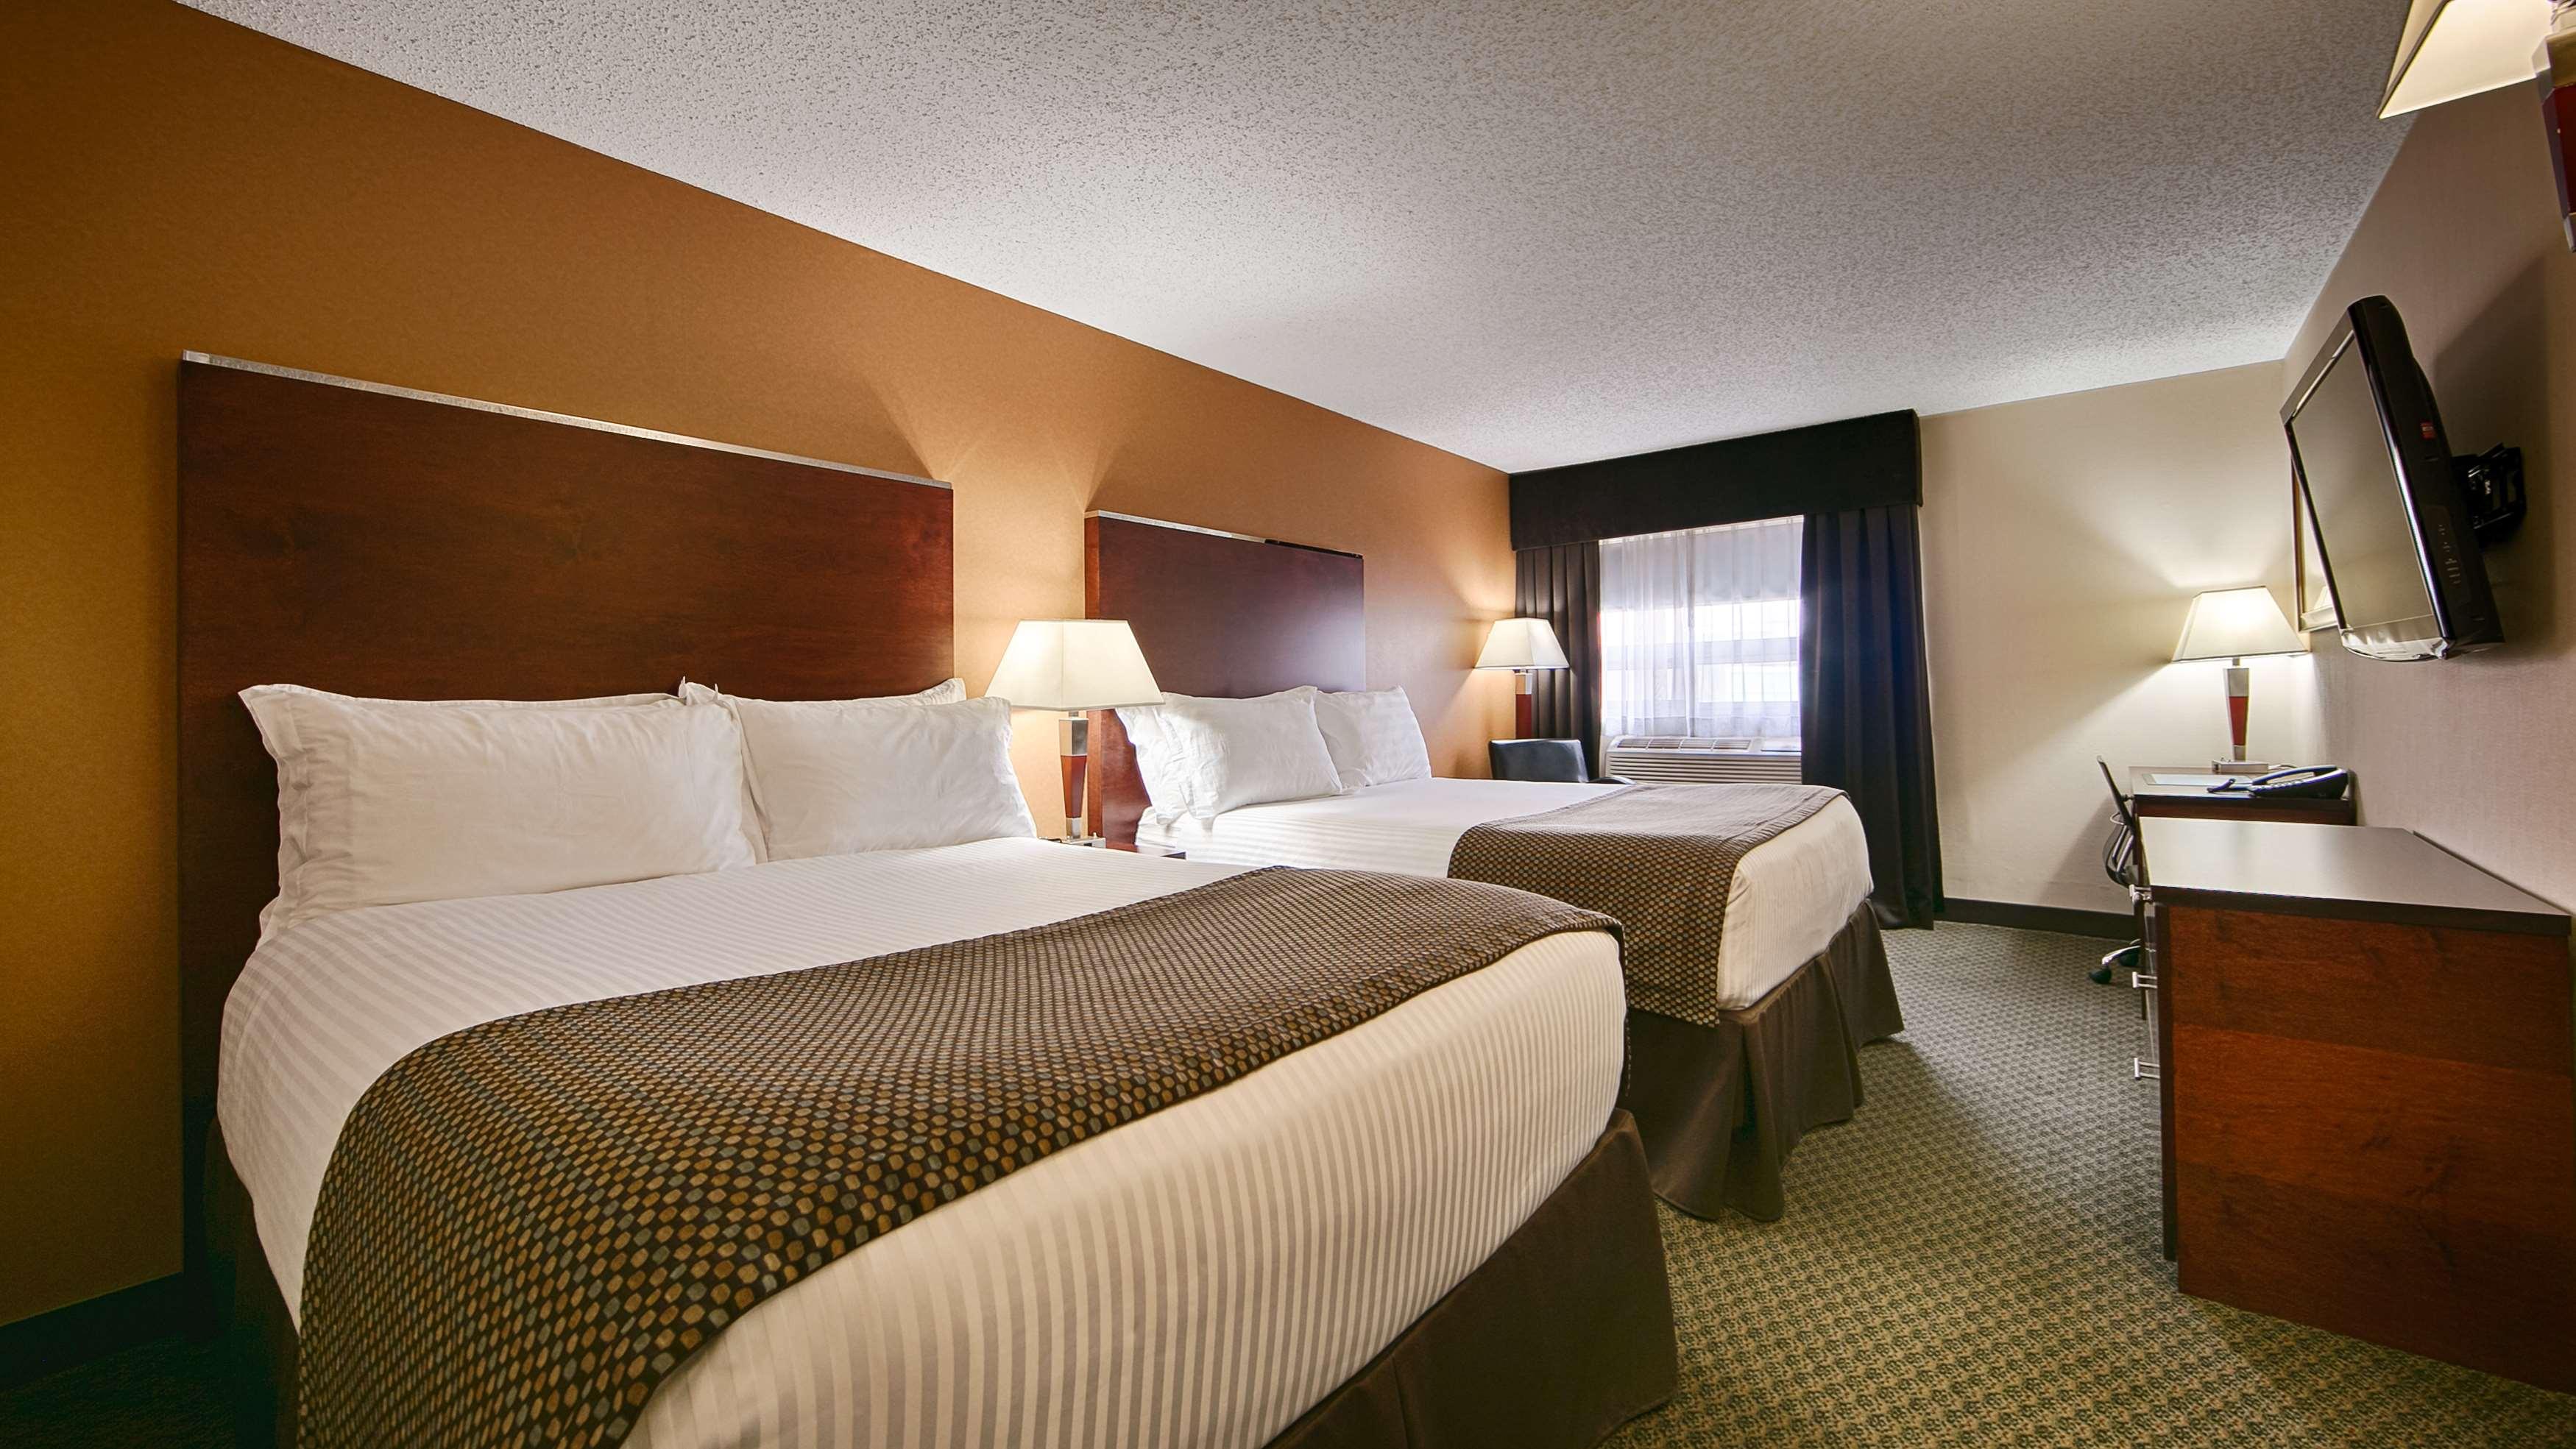 Best Western Airport Inn in Calgary: Two Queen Bed Guest Room